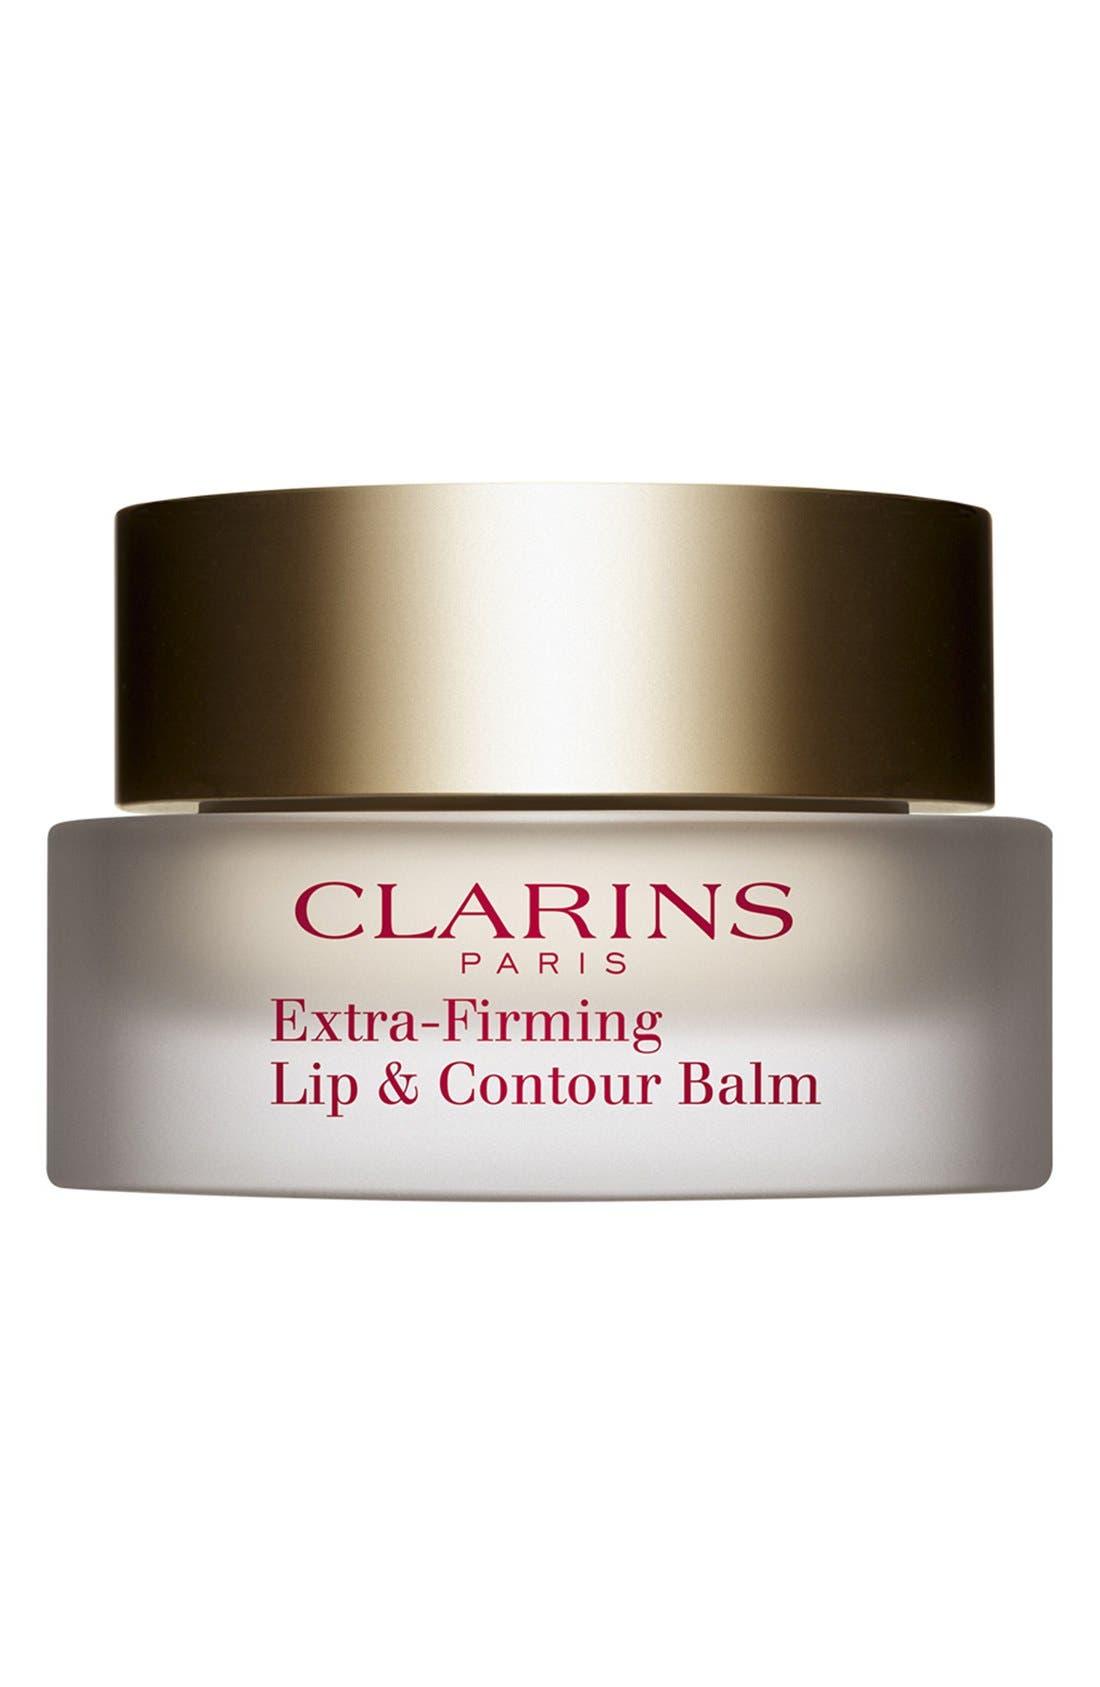 Clarins 'Extra-Firming' Lip & Contour Balm